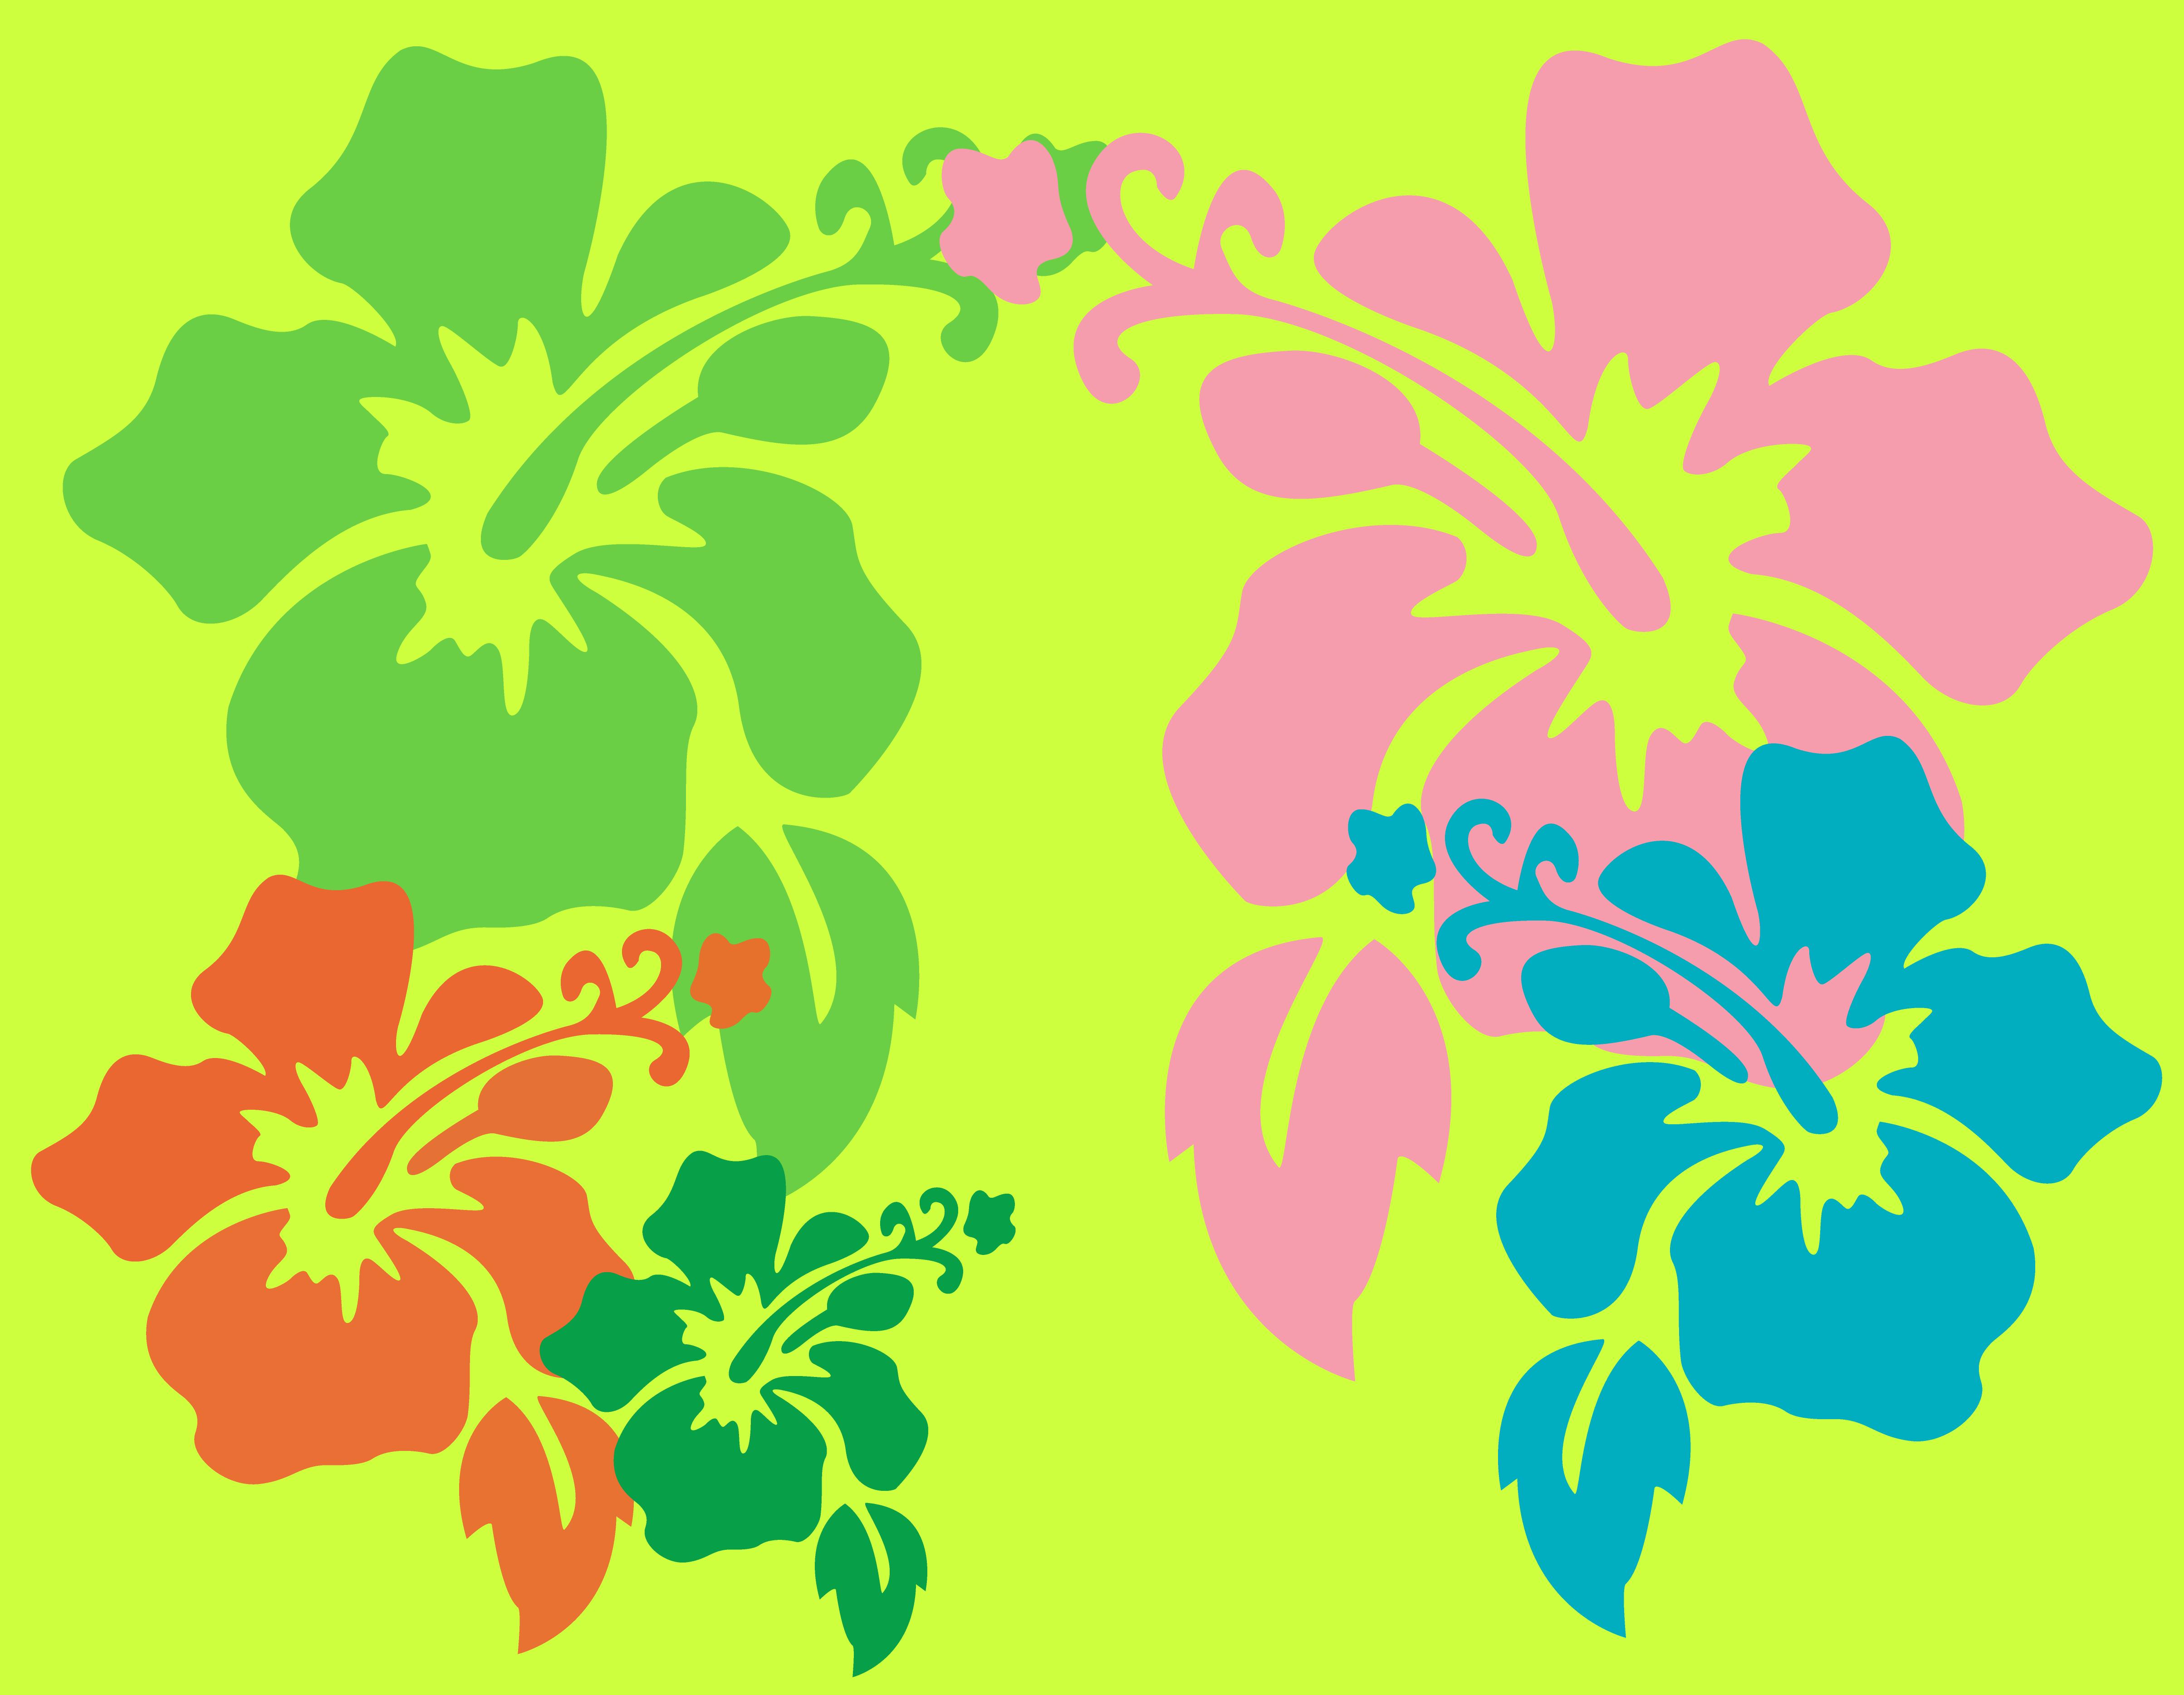 Hawaiian flower backgrounds wallpapersafari hawaiian flower wallpaper by dtgraphicsandprints 4814x3736 izmirmasajfo